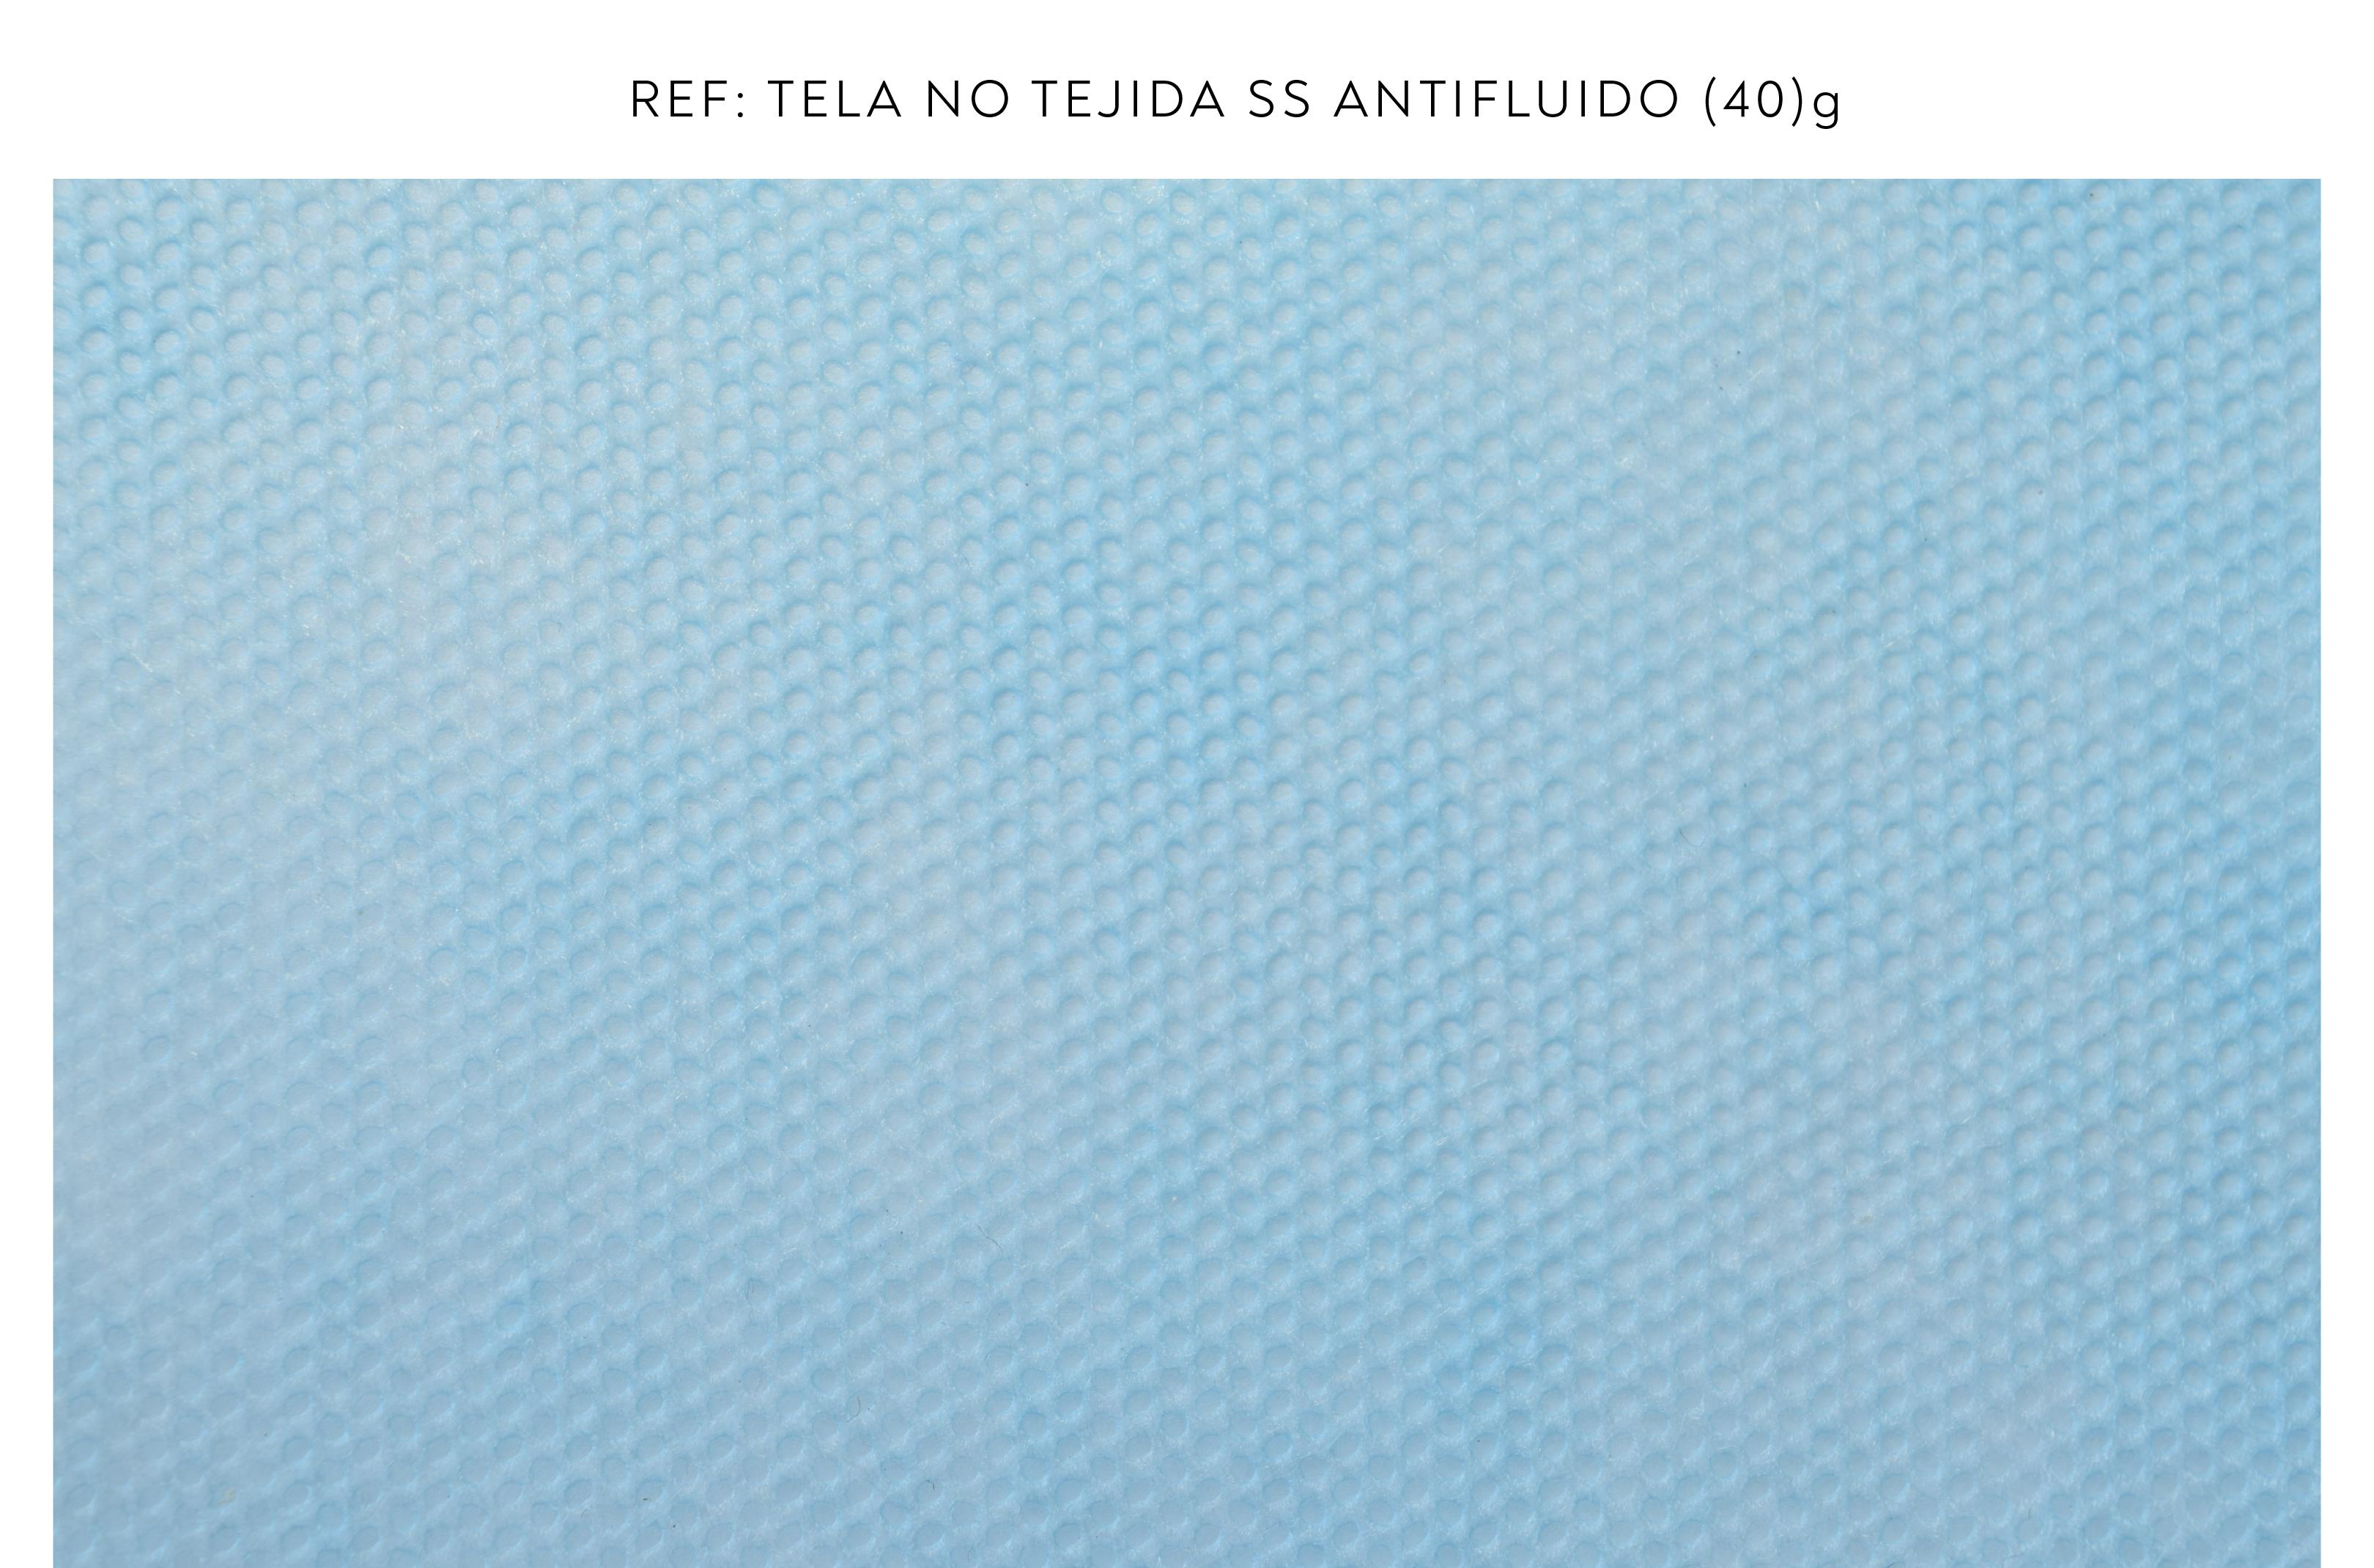 Tela no tejida azul 40g